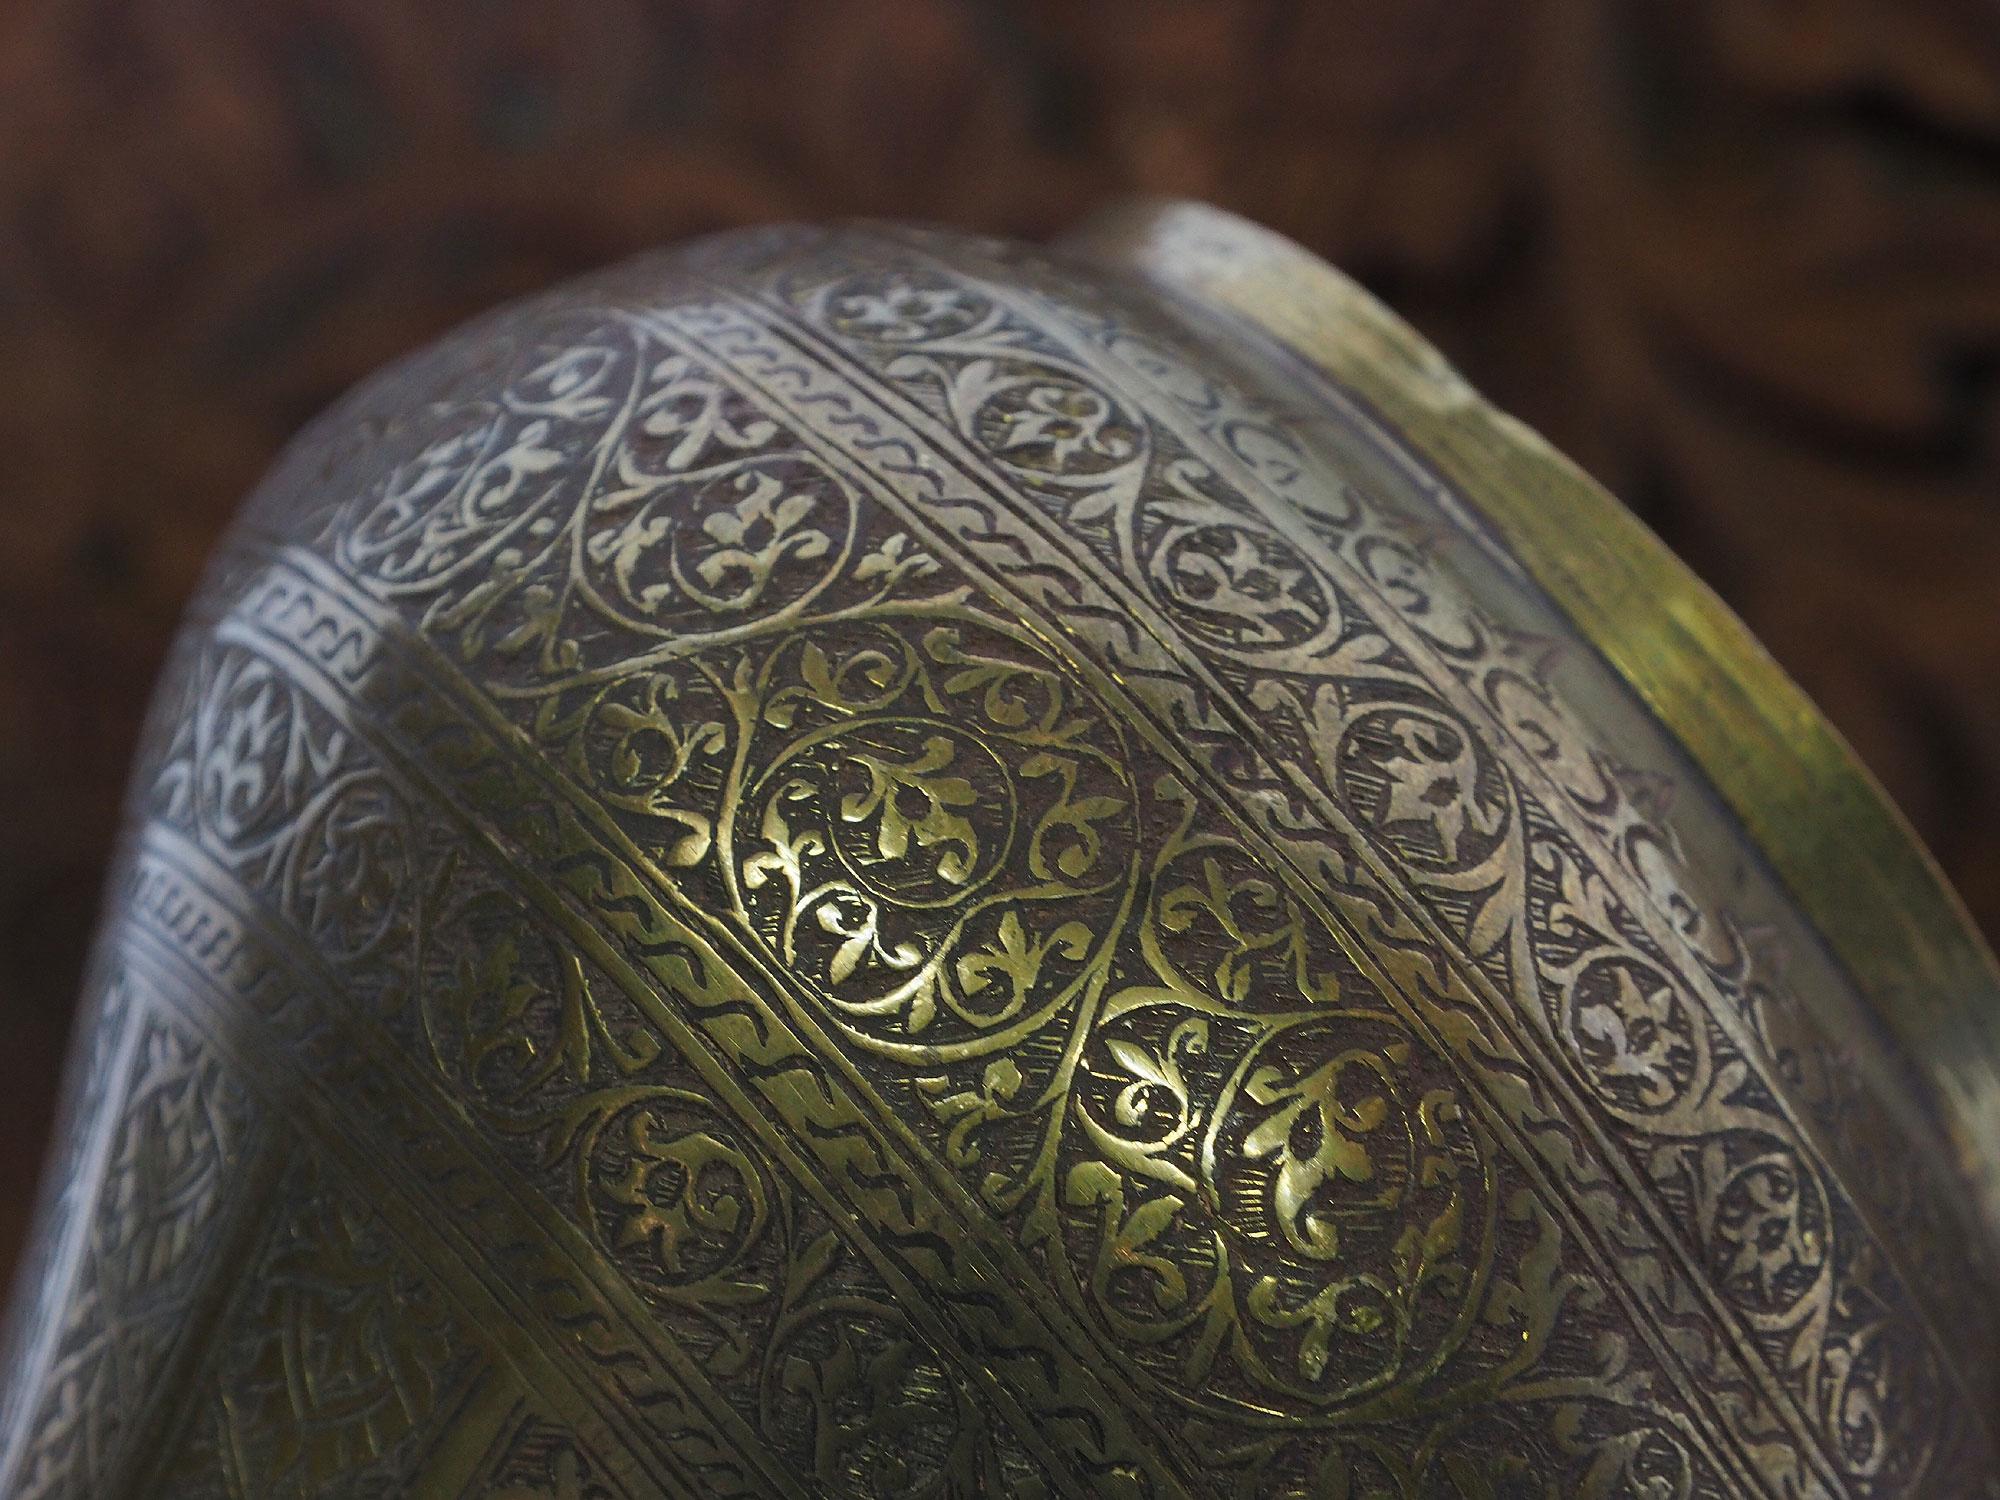 antik Massiv islamische Messing Wasserpfeife shisha Hookahs Schischa nargile Kalian aus Afghanistan Nr:19/13